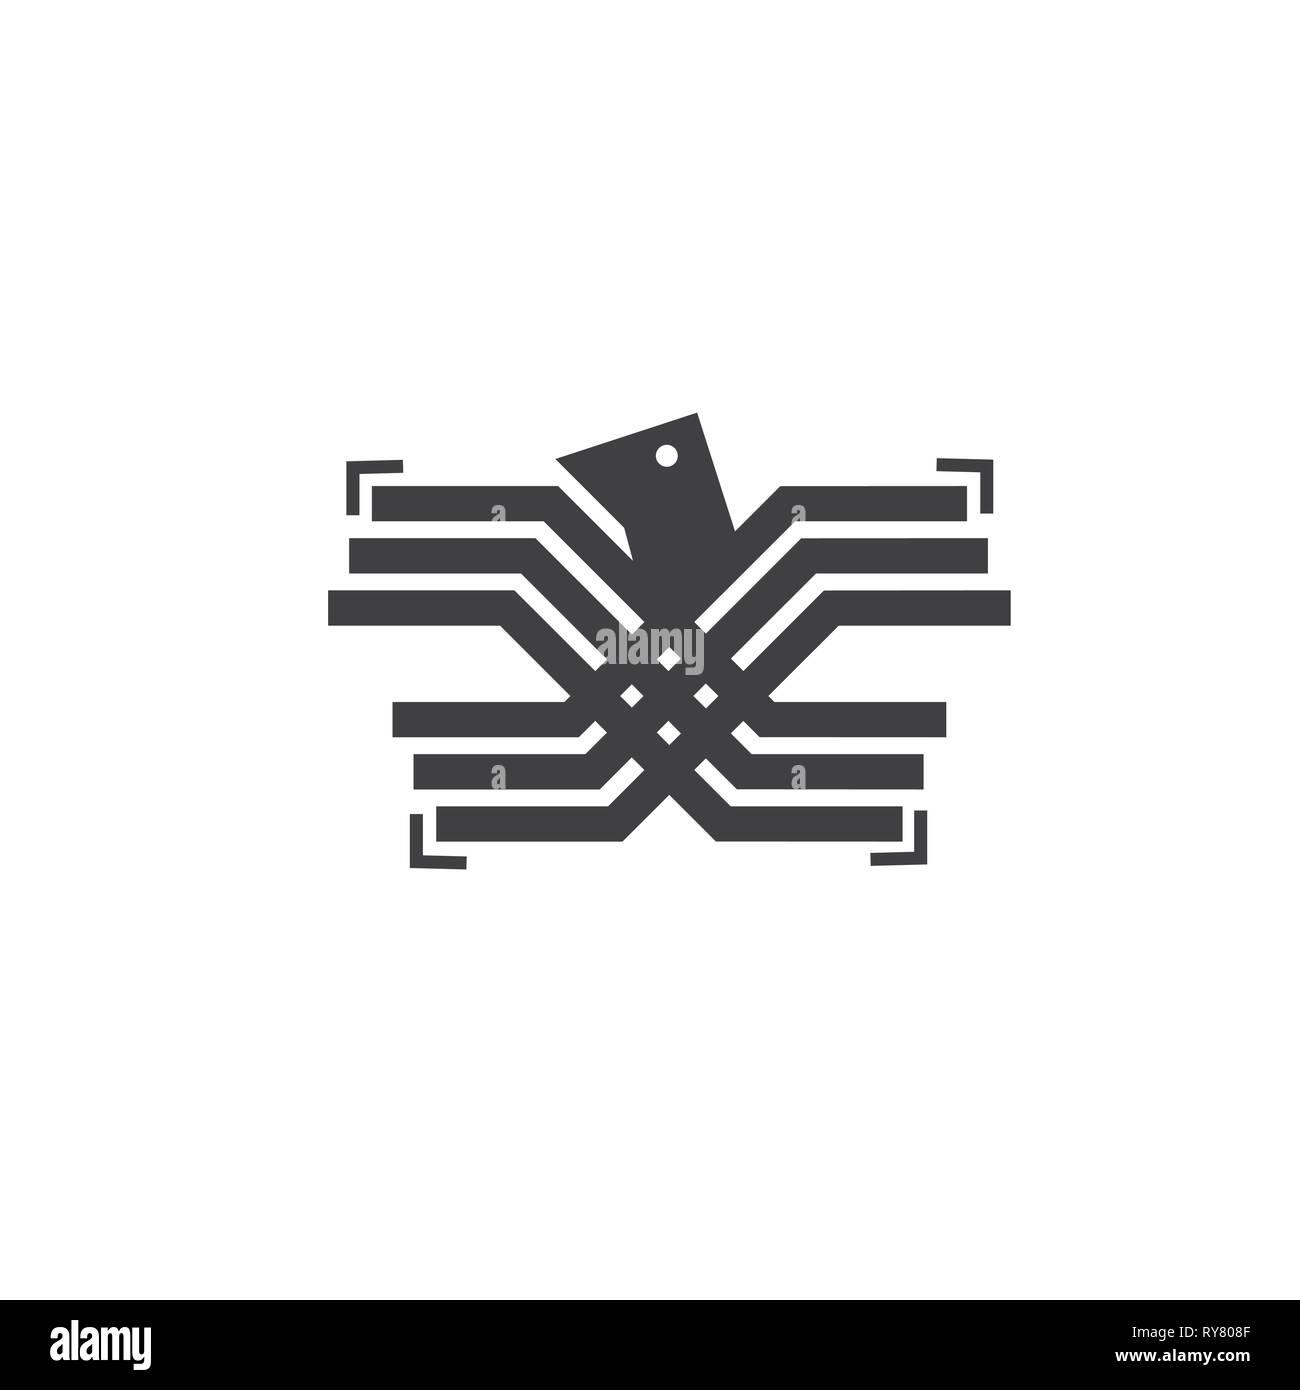 stripes eagle wings simple logo vector stock vector image art alamy https www alamy com stripes eagle wings simple logo vector image240506351 html